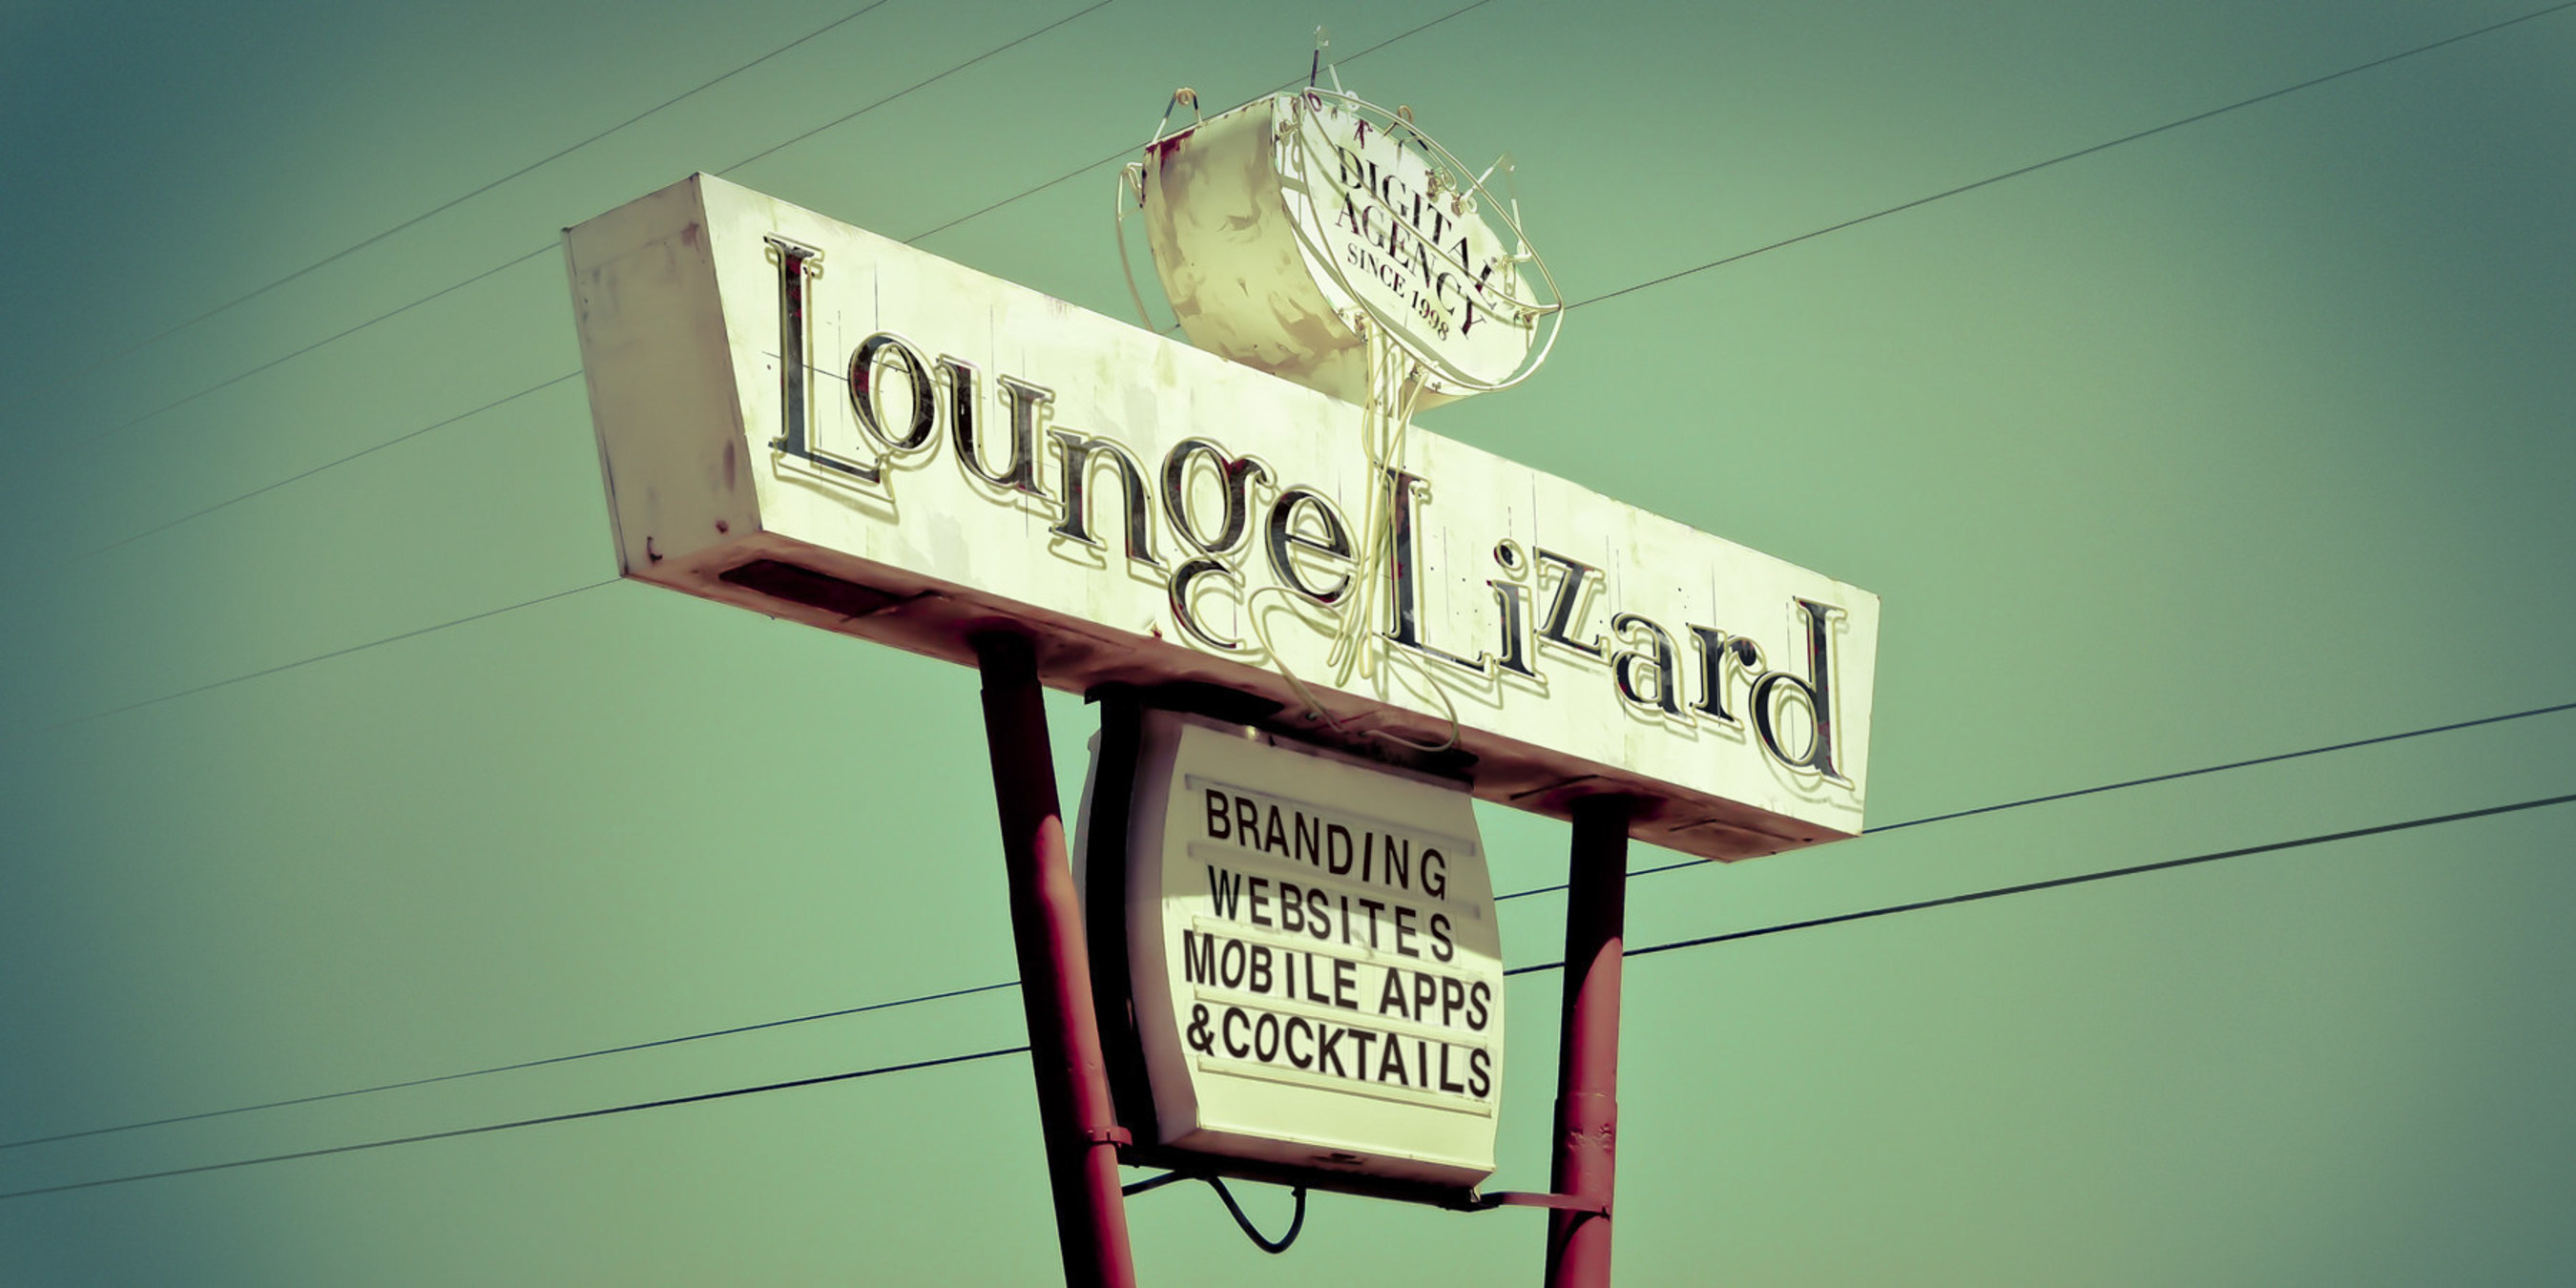 Lounge Lizard Shares 5 Best Practices for Mobile App Design